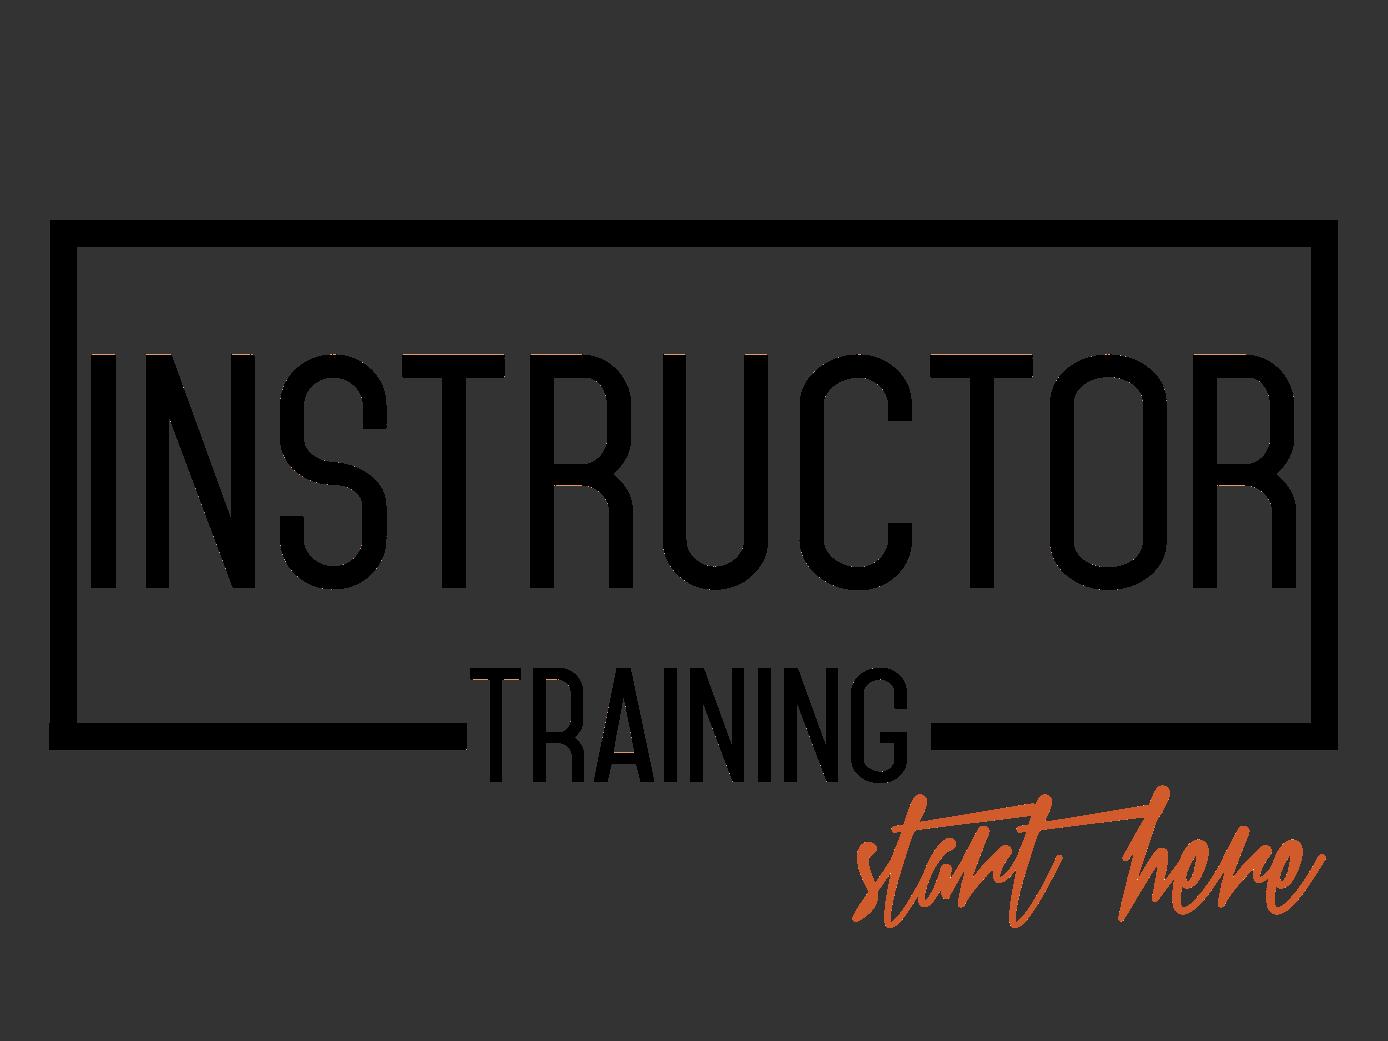 Task Specific Instructor Training Bundle